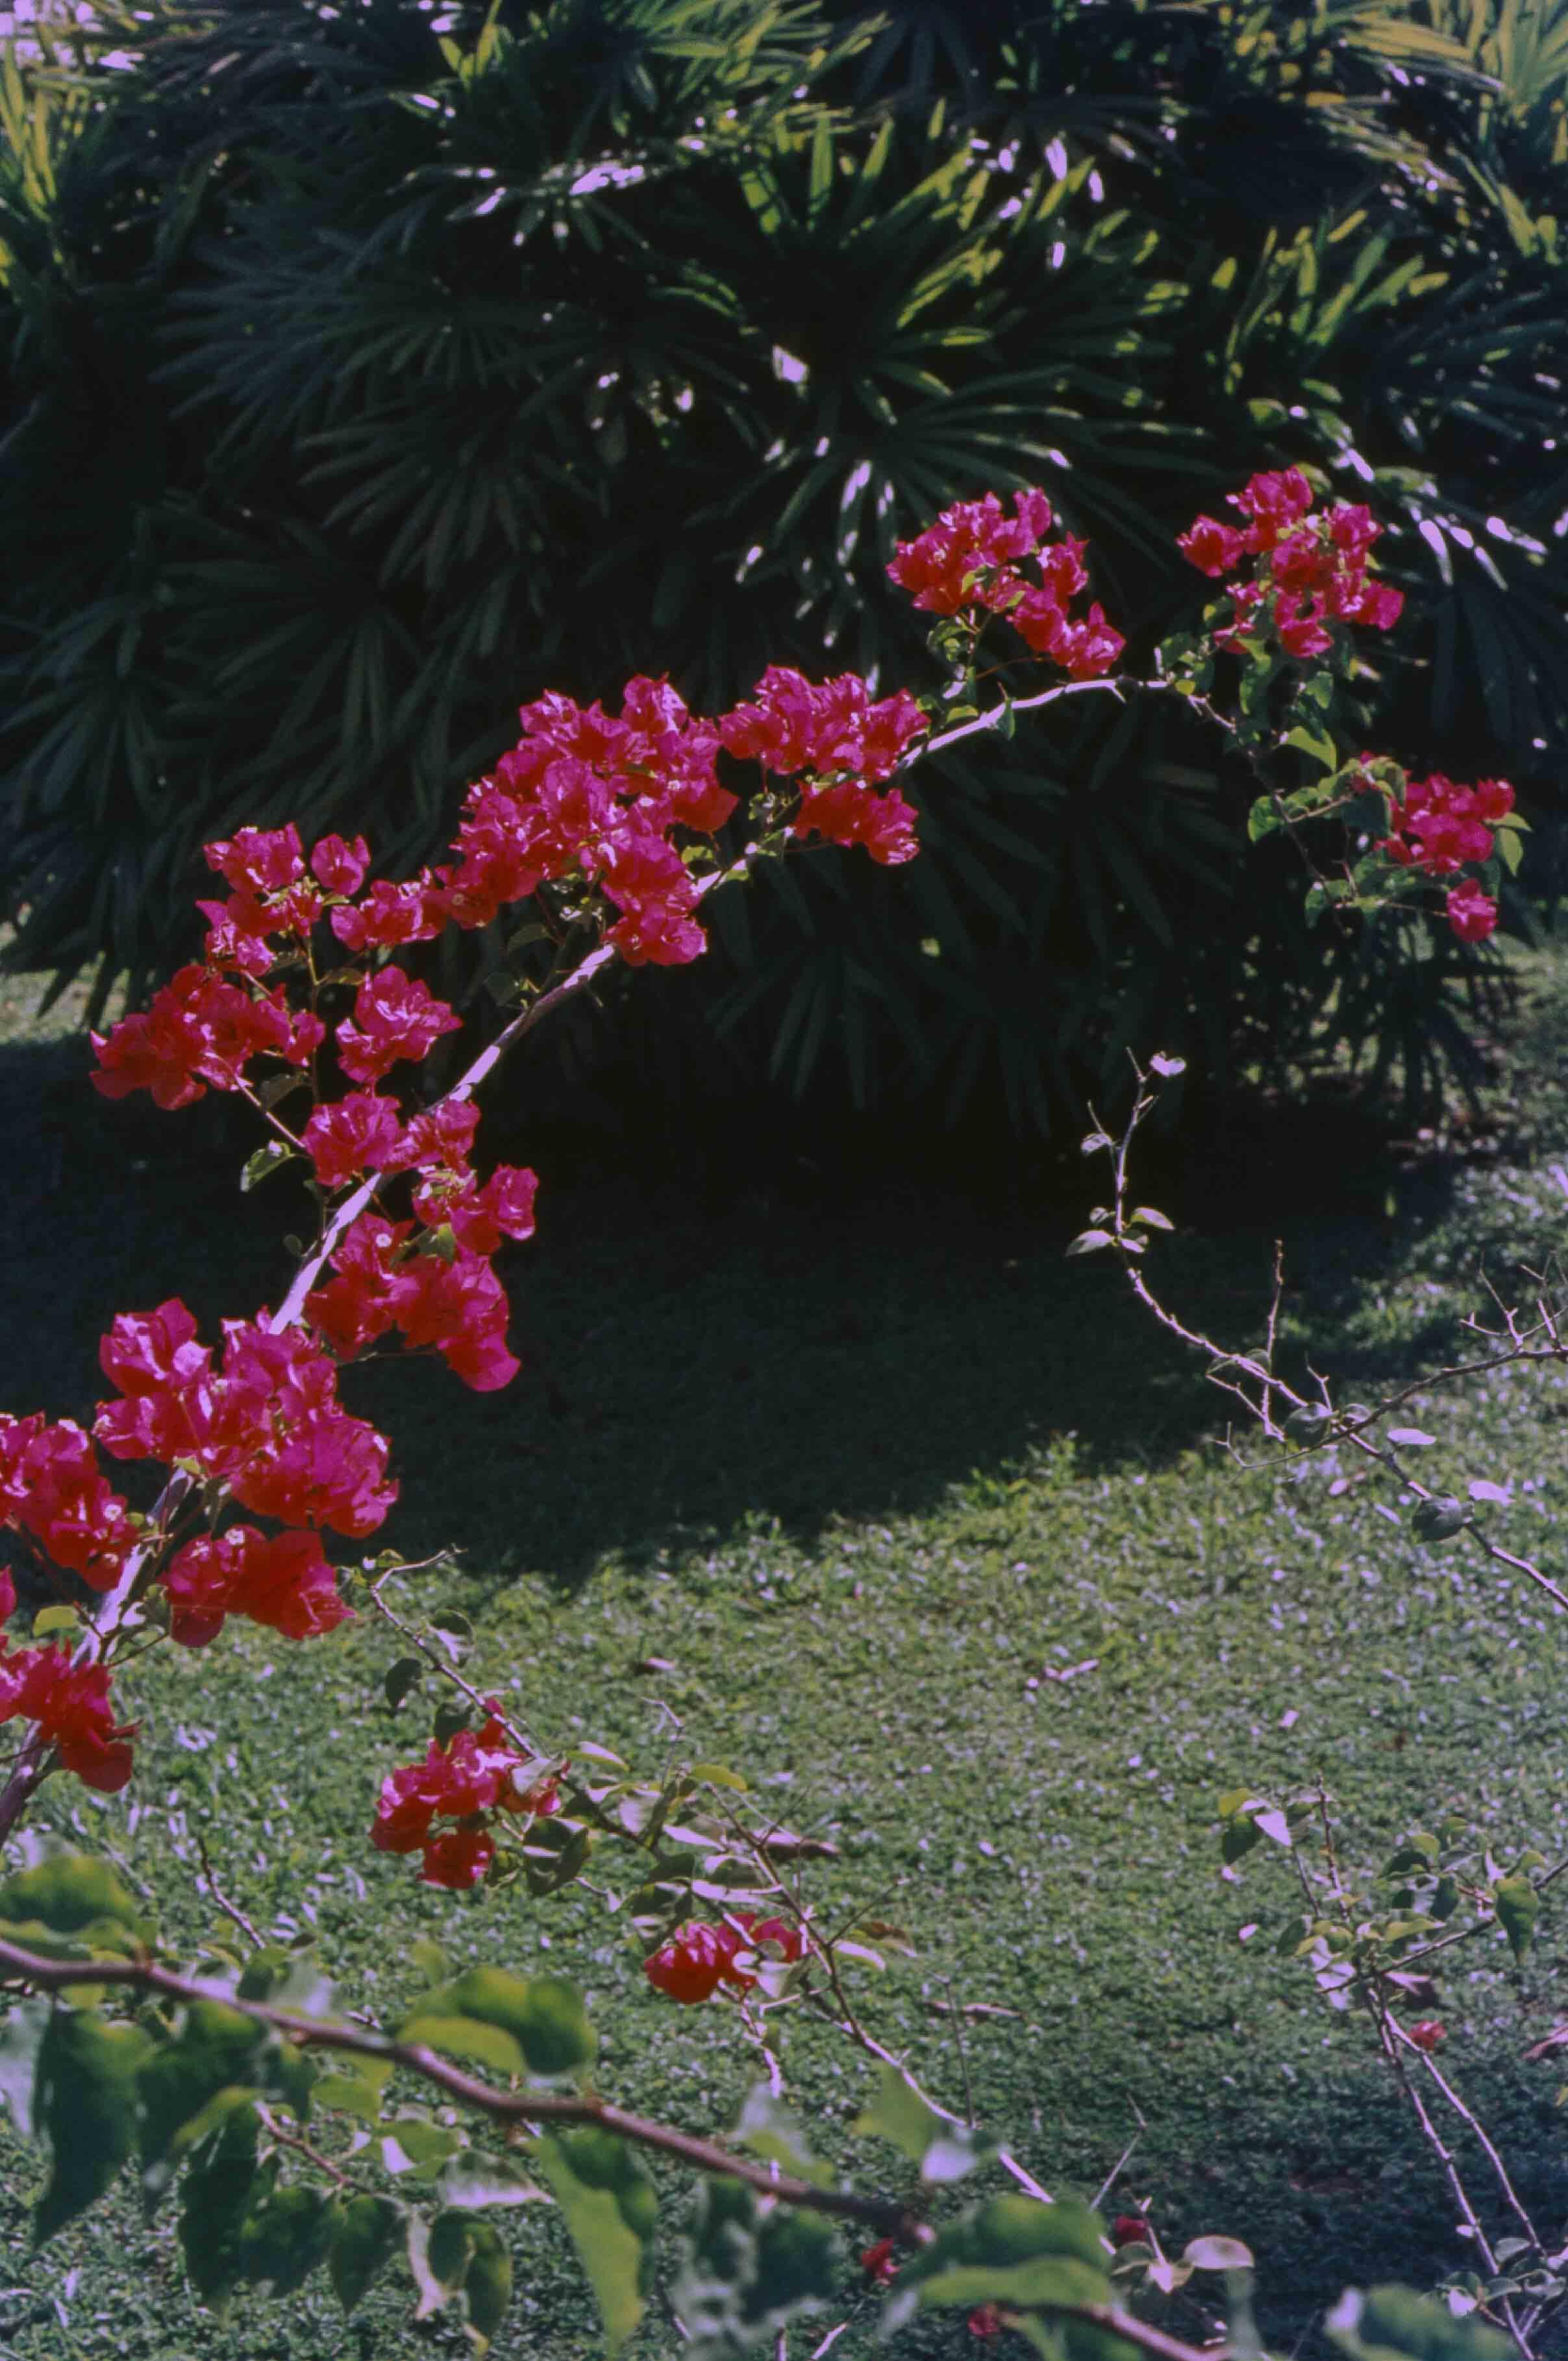 242. Suriname